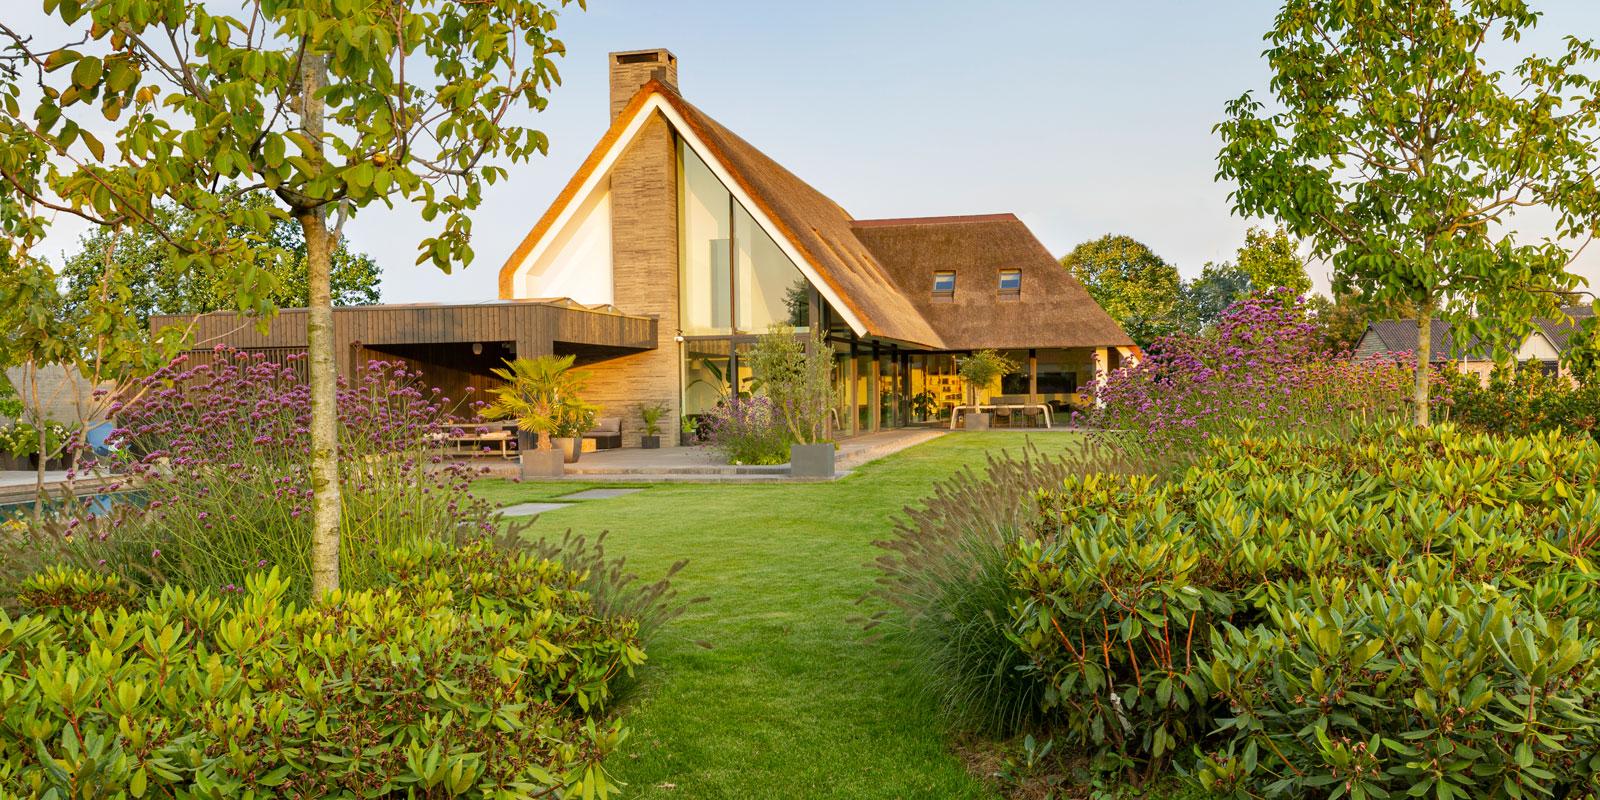 Rieten dak, Paul Segers, the art of living